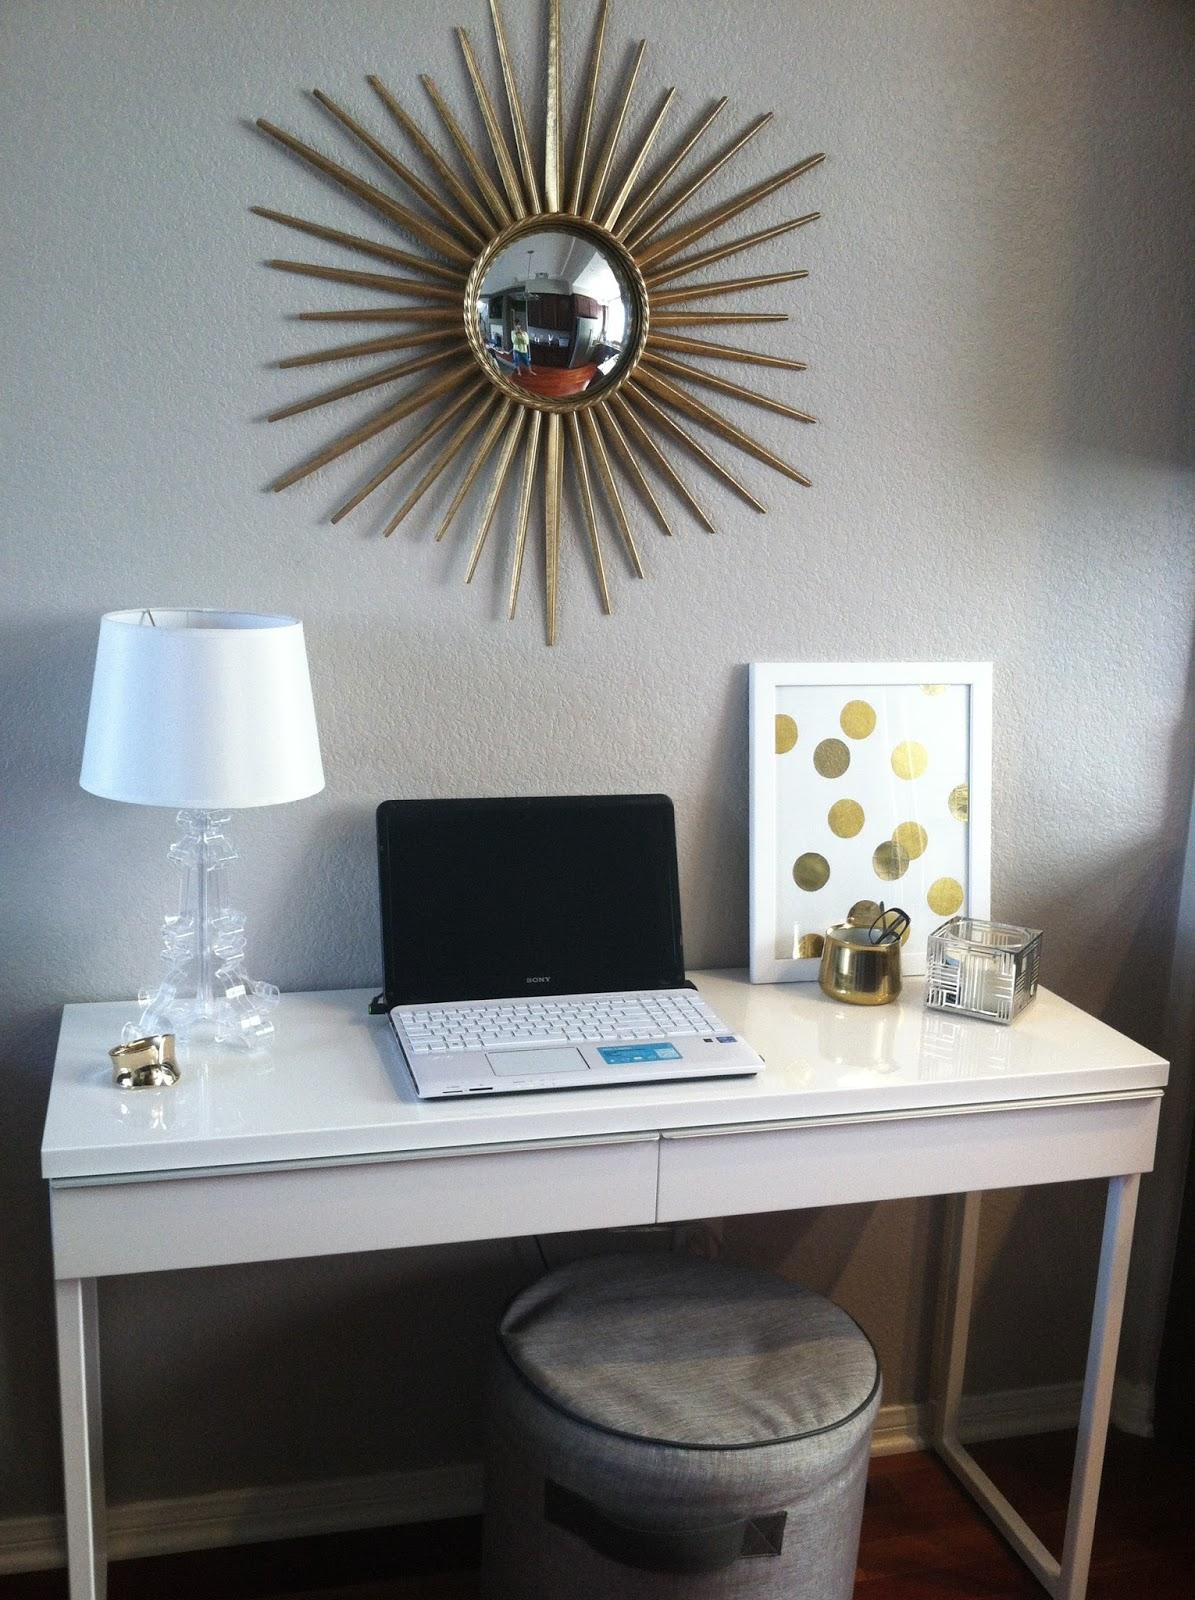 Besta Burs Desk Ikea Elegant Ikea Besta Table Best Images On Room  # Meuble Tv Ikea Besta Burs Noir